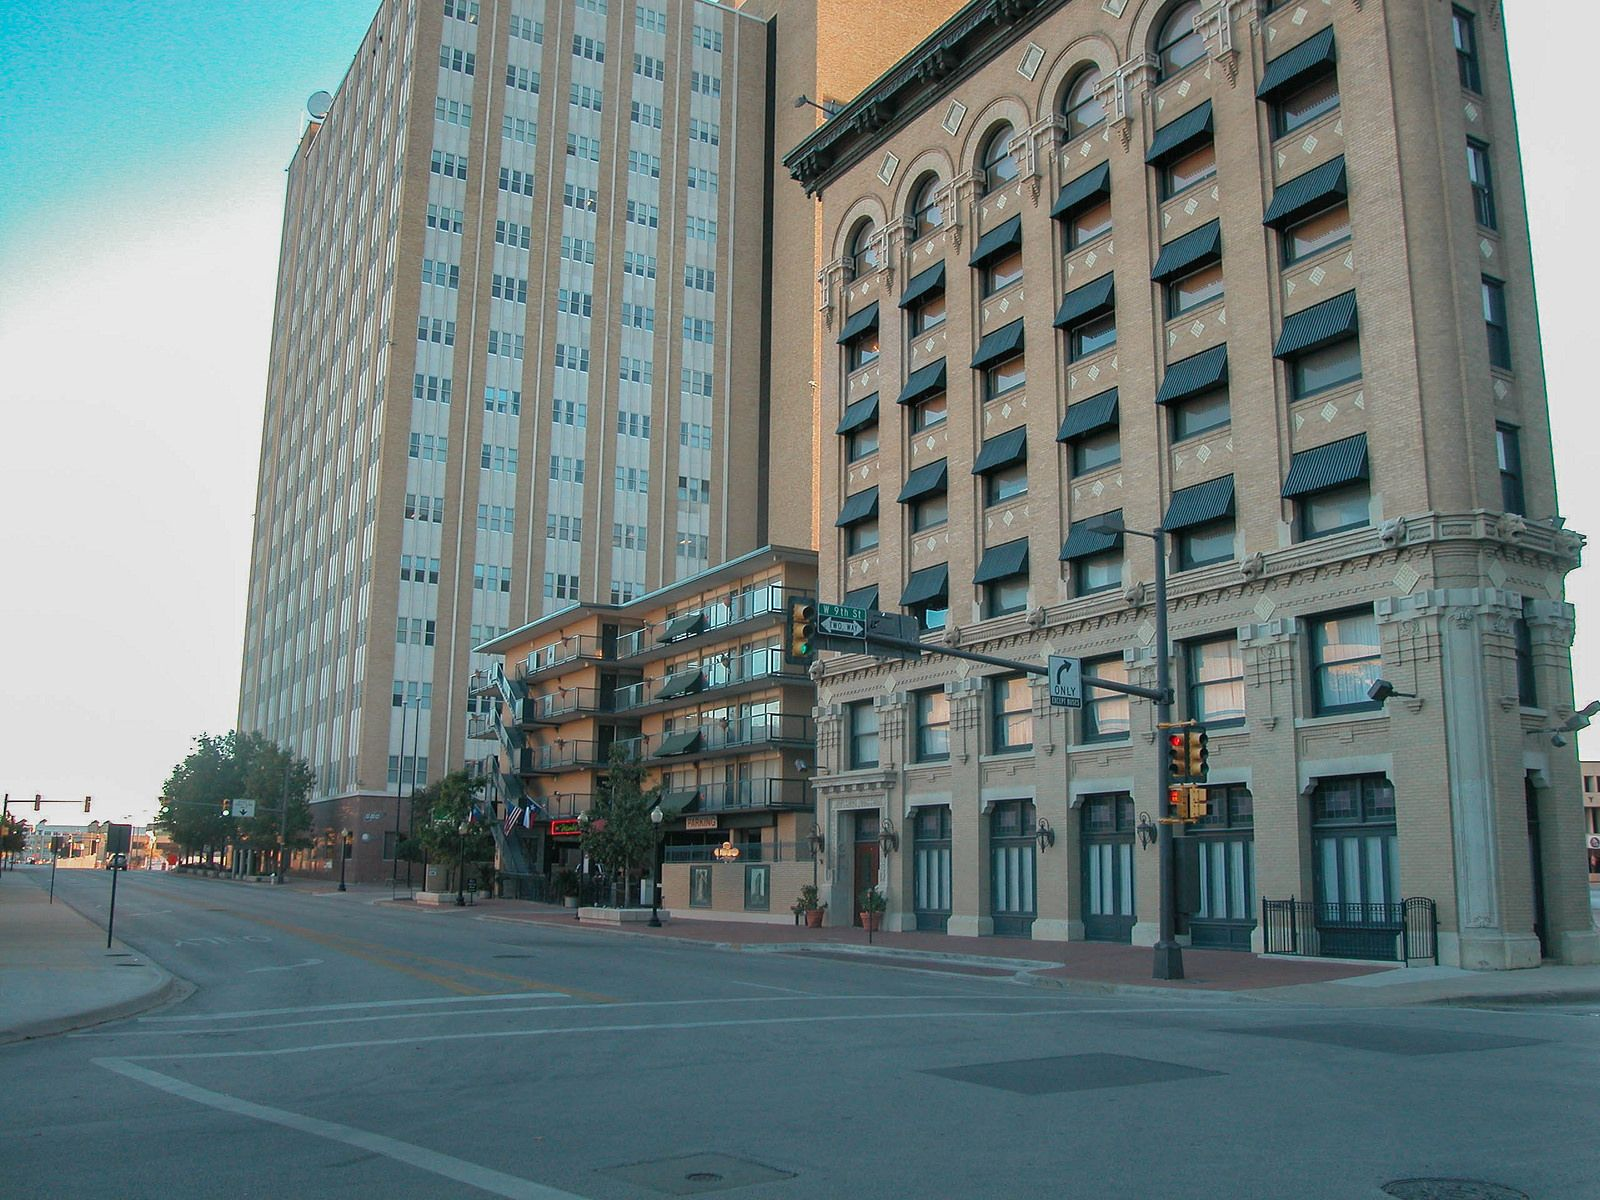 Dallas-Fort Worth-Arlington, TX | Data USA